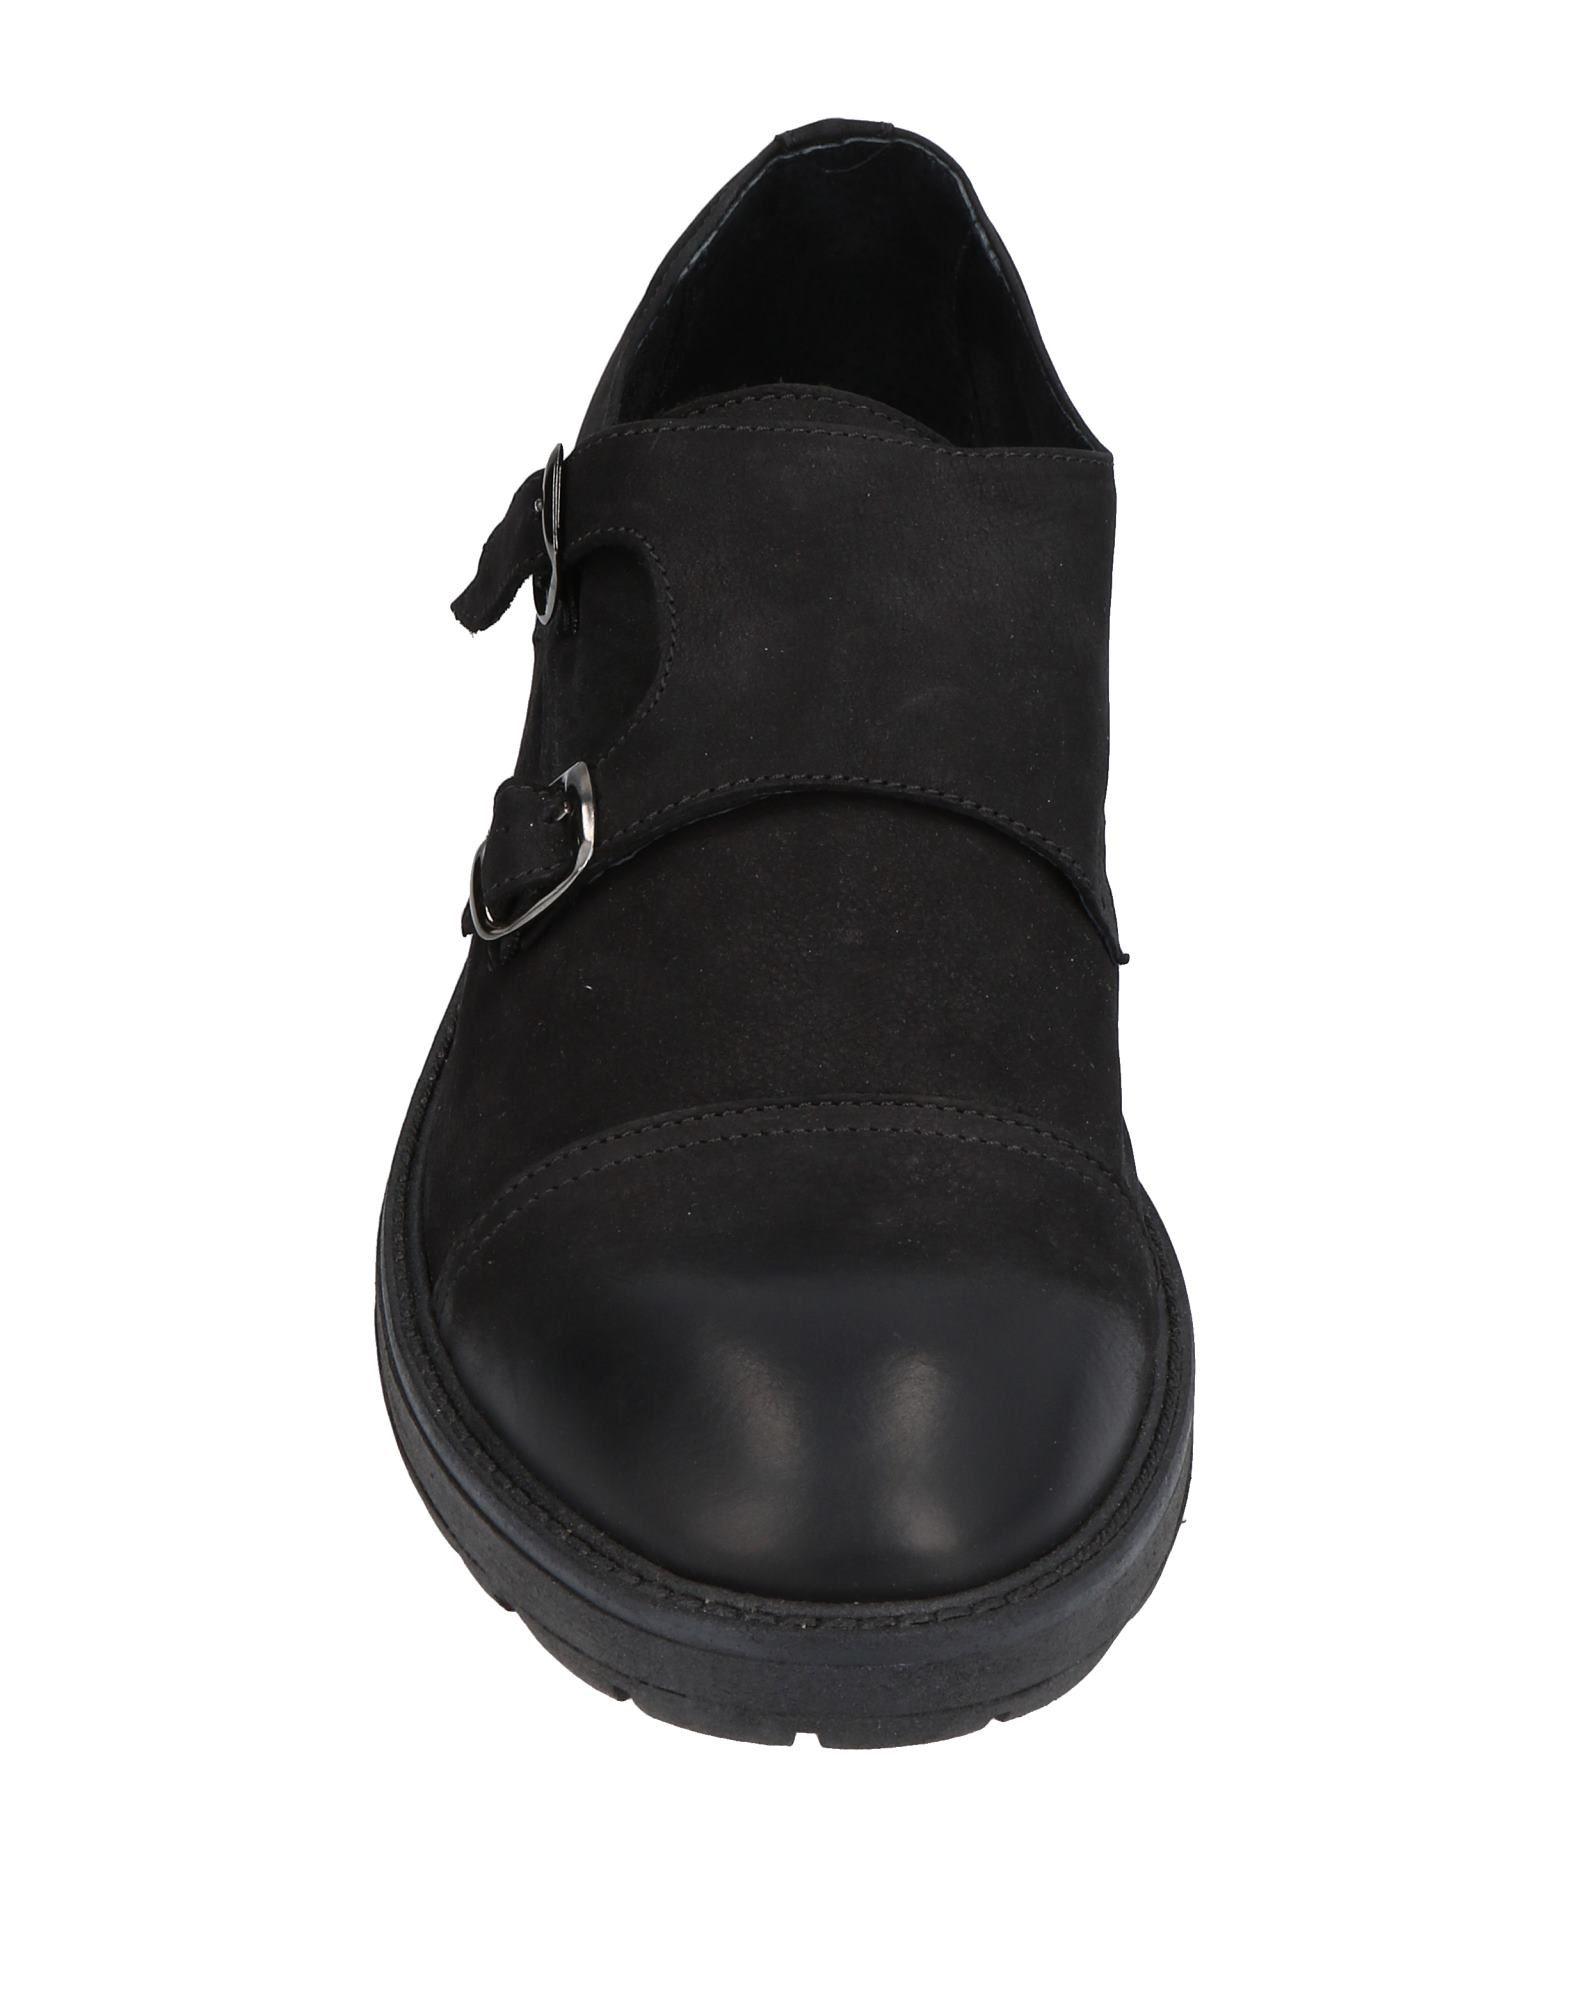 Rabatt echte 11465200NP Schuhe Exibit Mokassins Herren  11465200NP echte 9e8aae